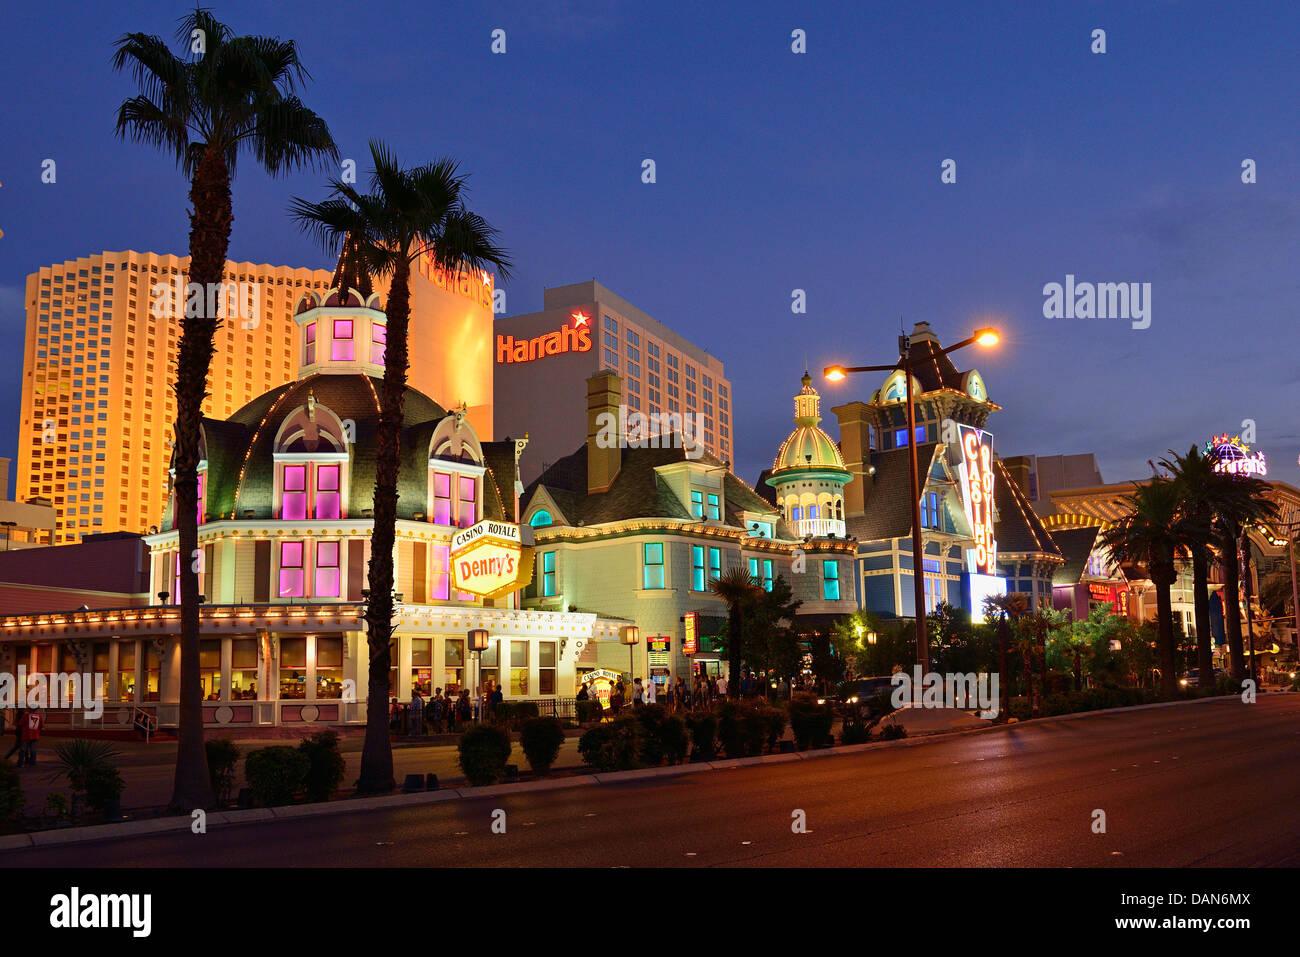 harrahs hotel and casino las vegas